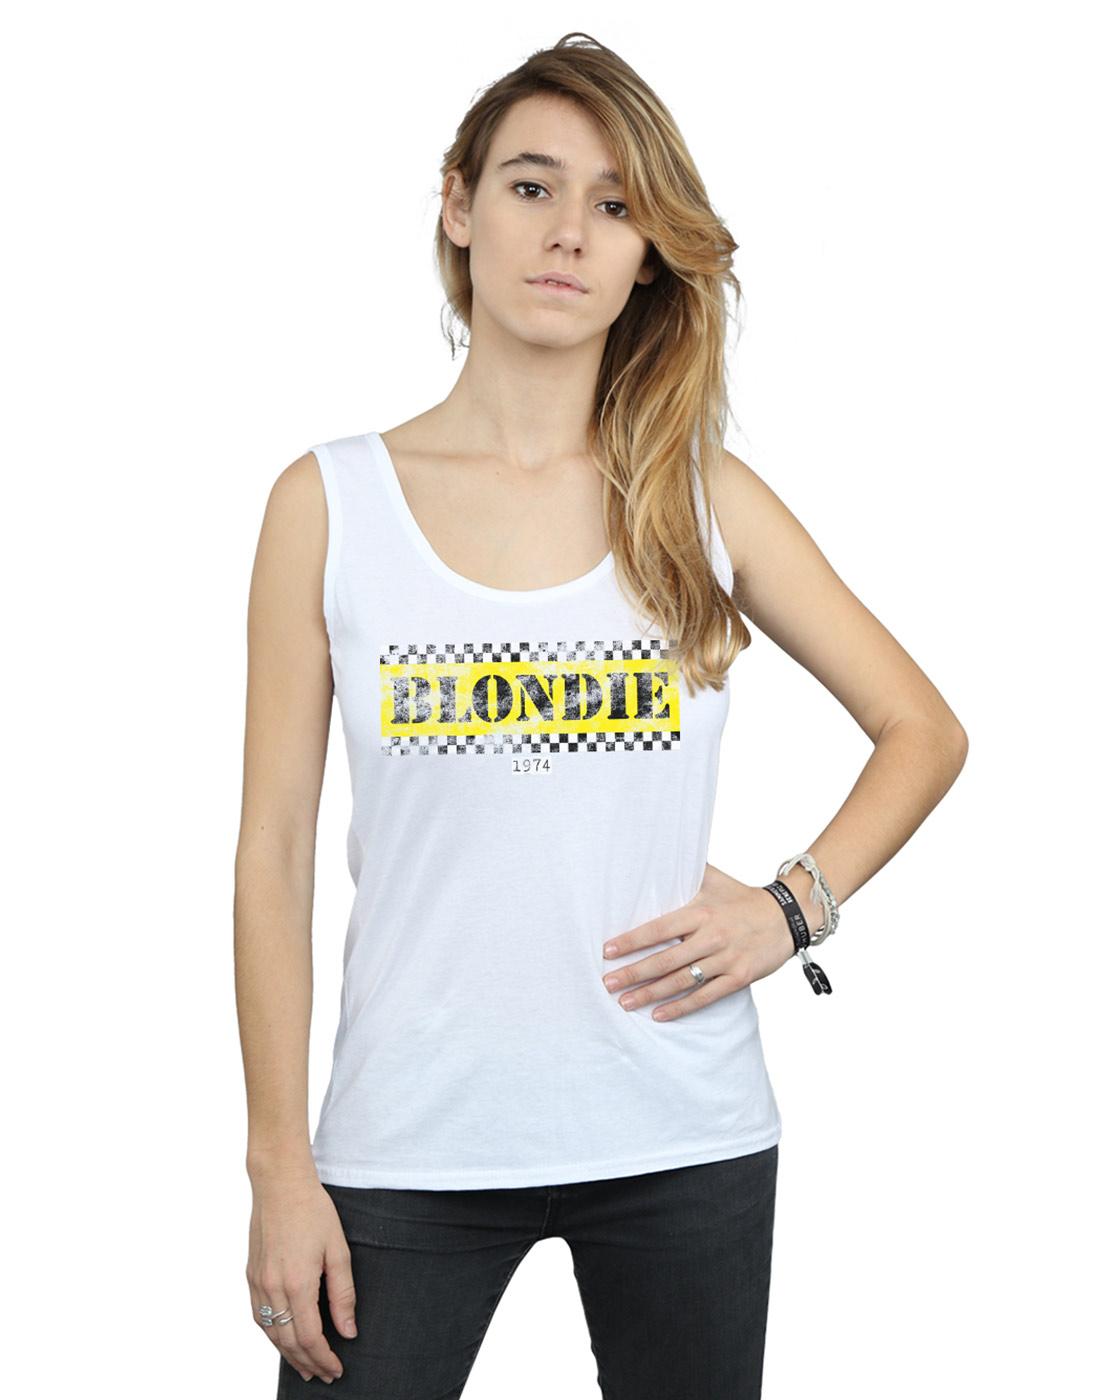 Blondie-Mujer-Taxi-74-Camiseta-Sin-Mangas